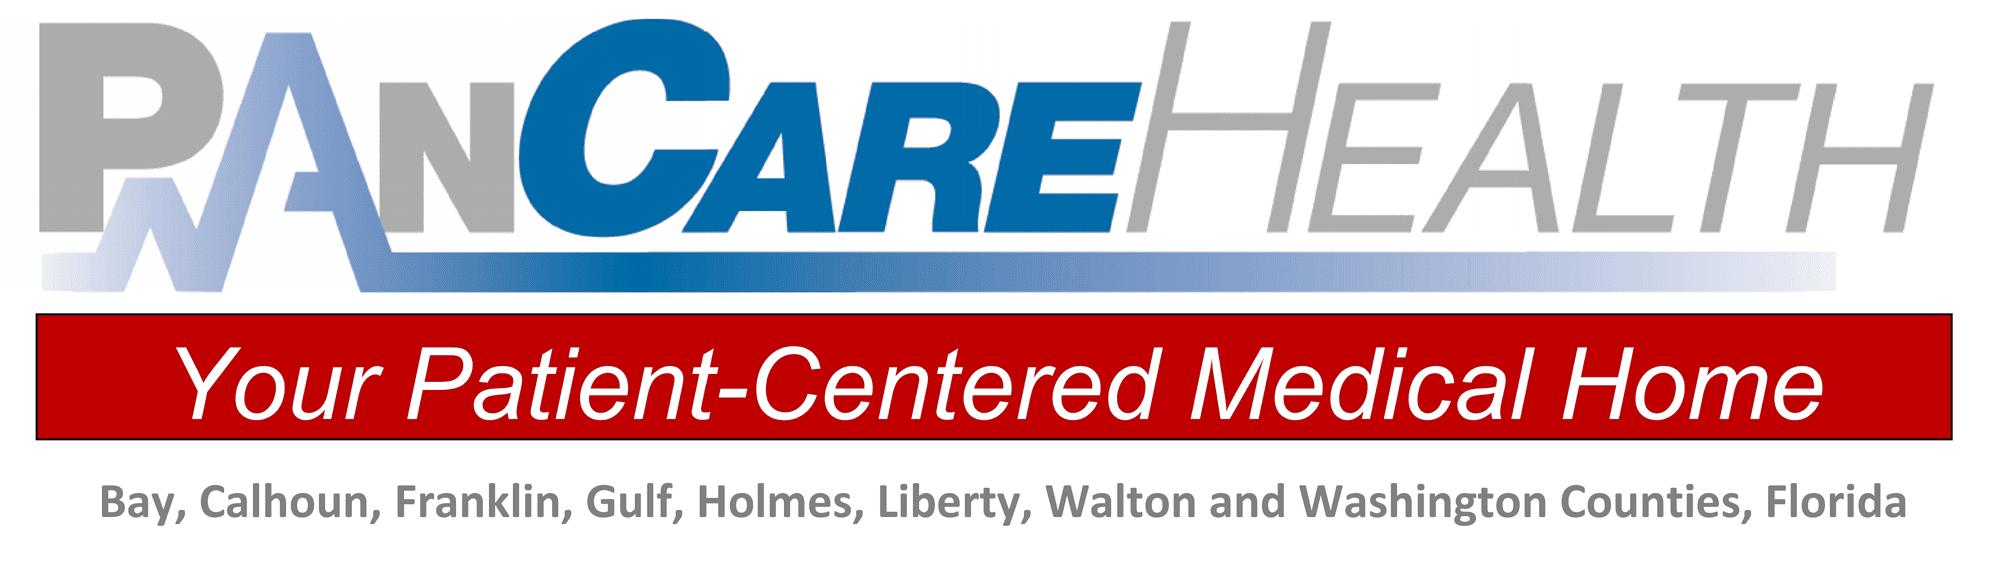 PanCare Health logo